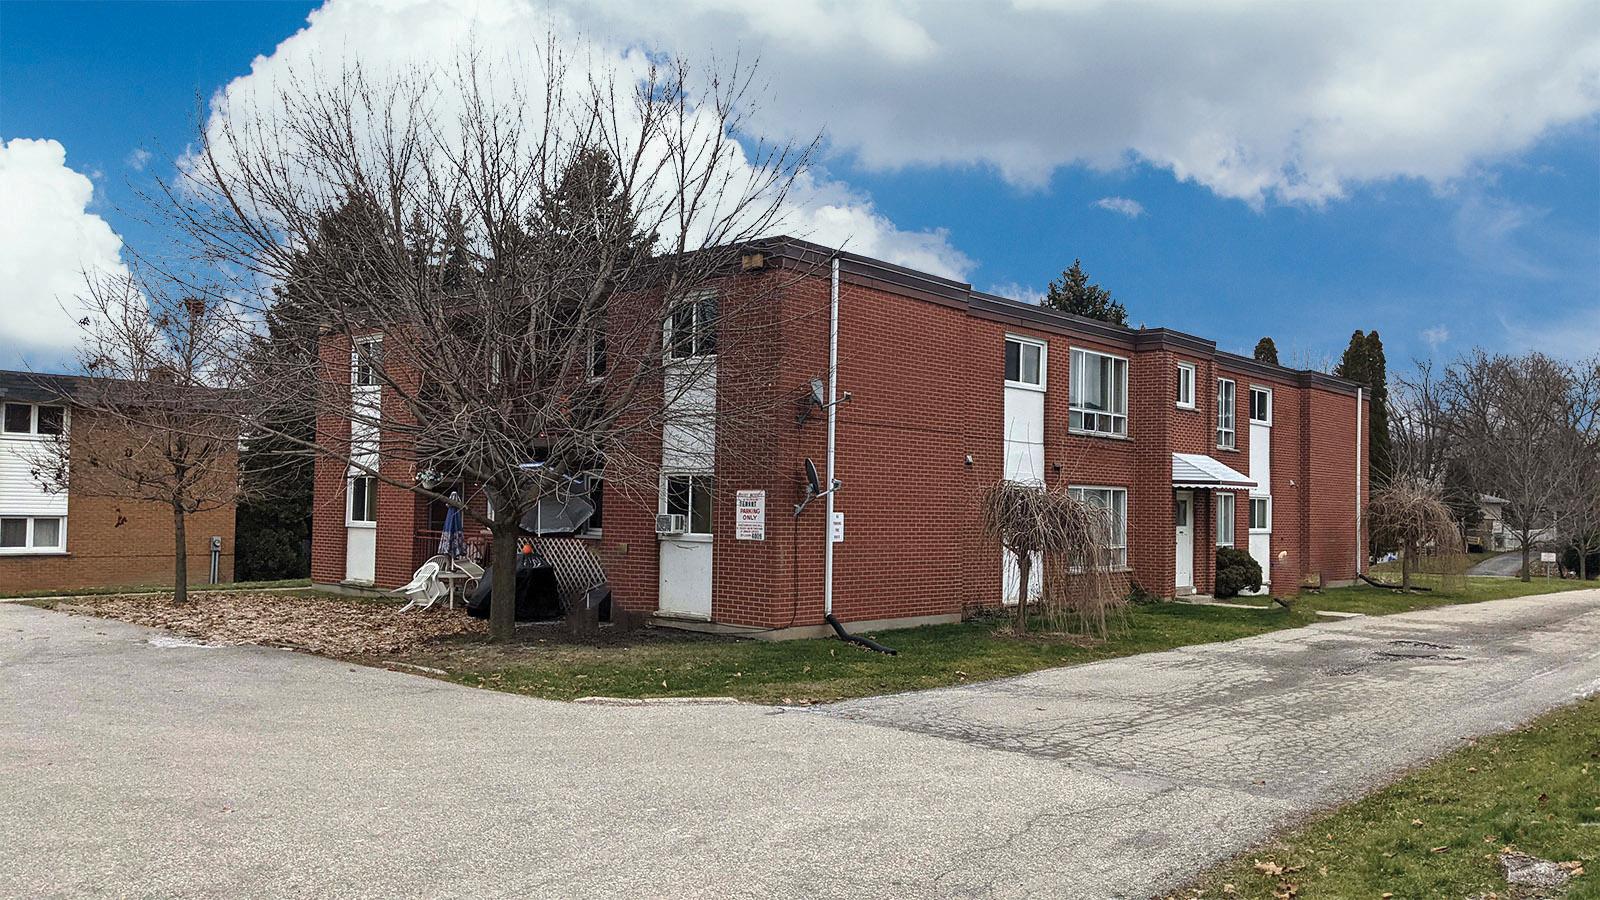 8 Unit Apartment Building